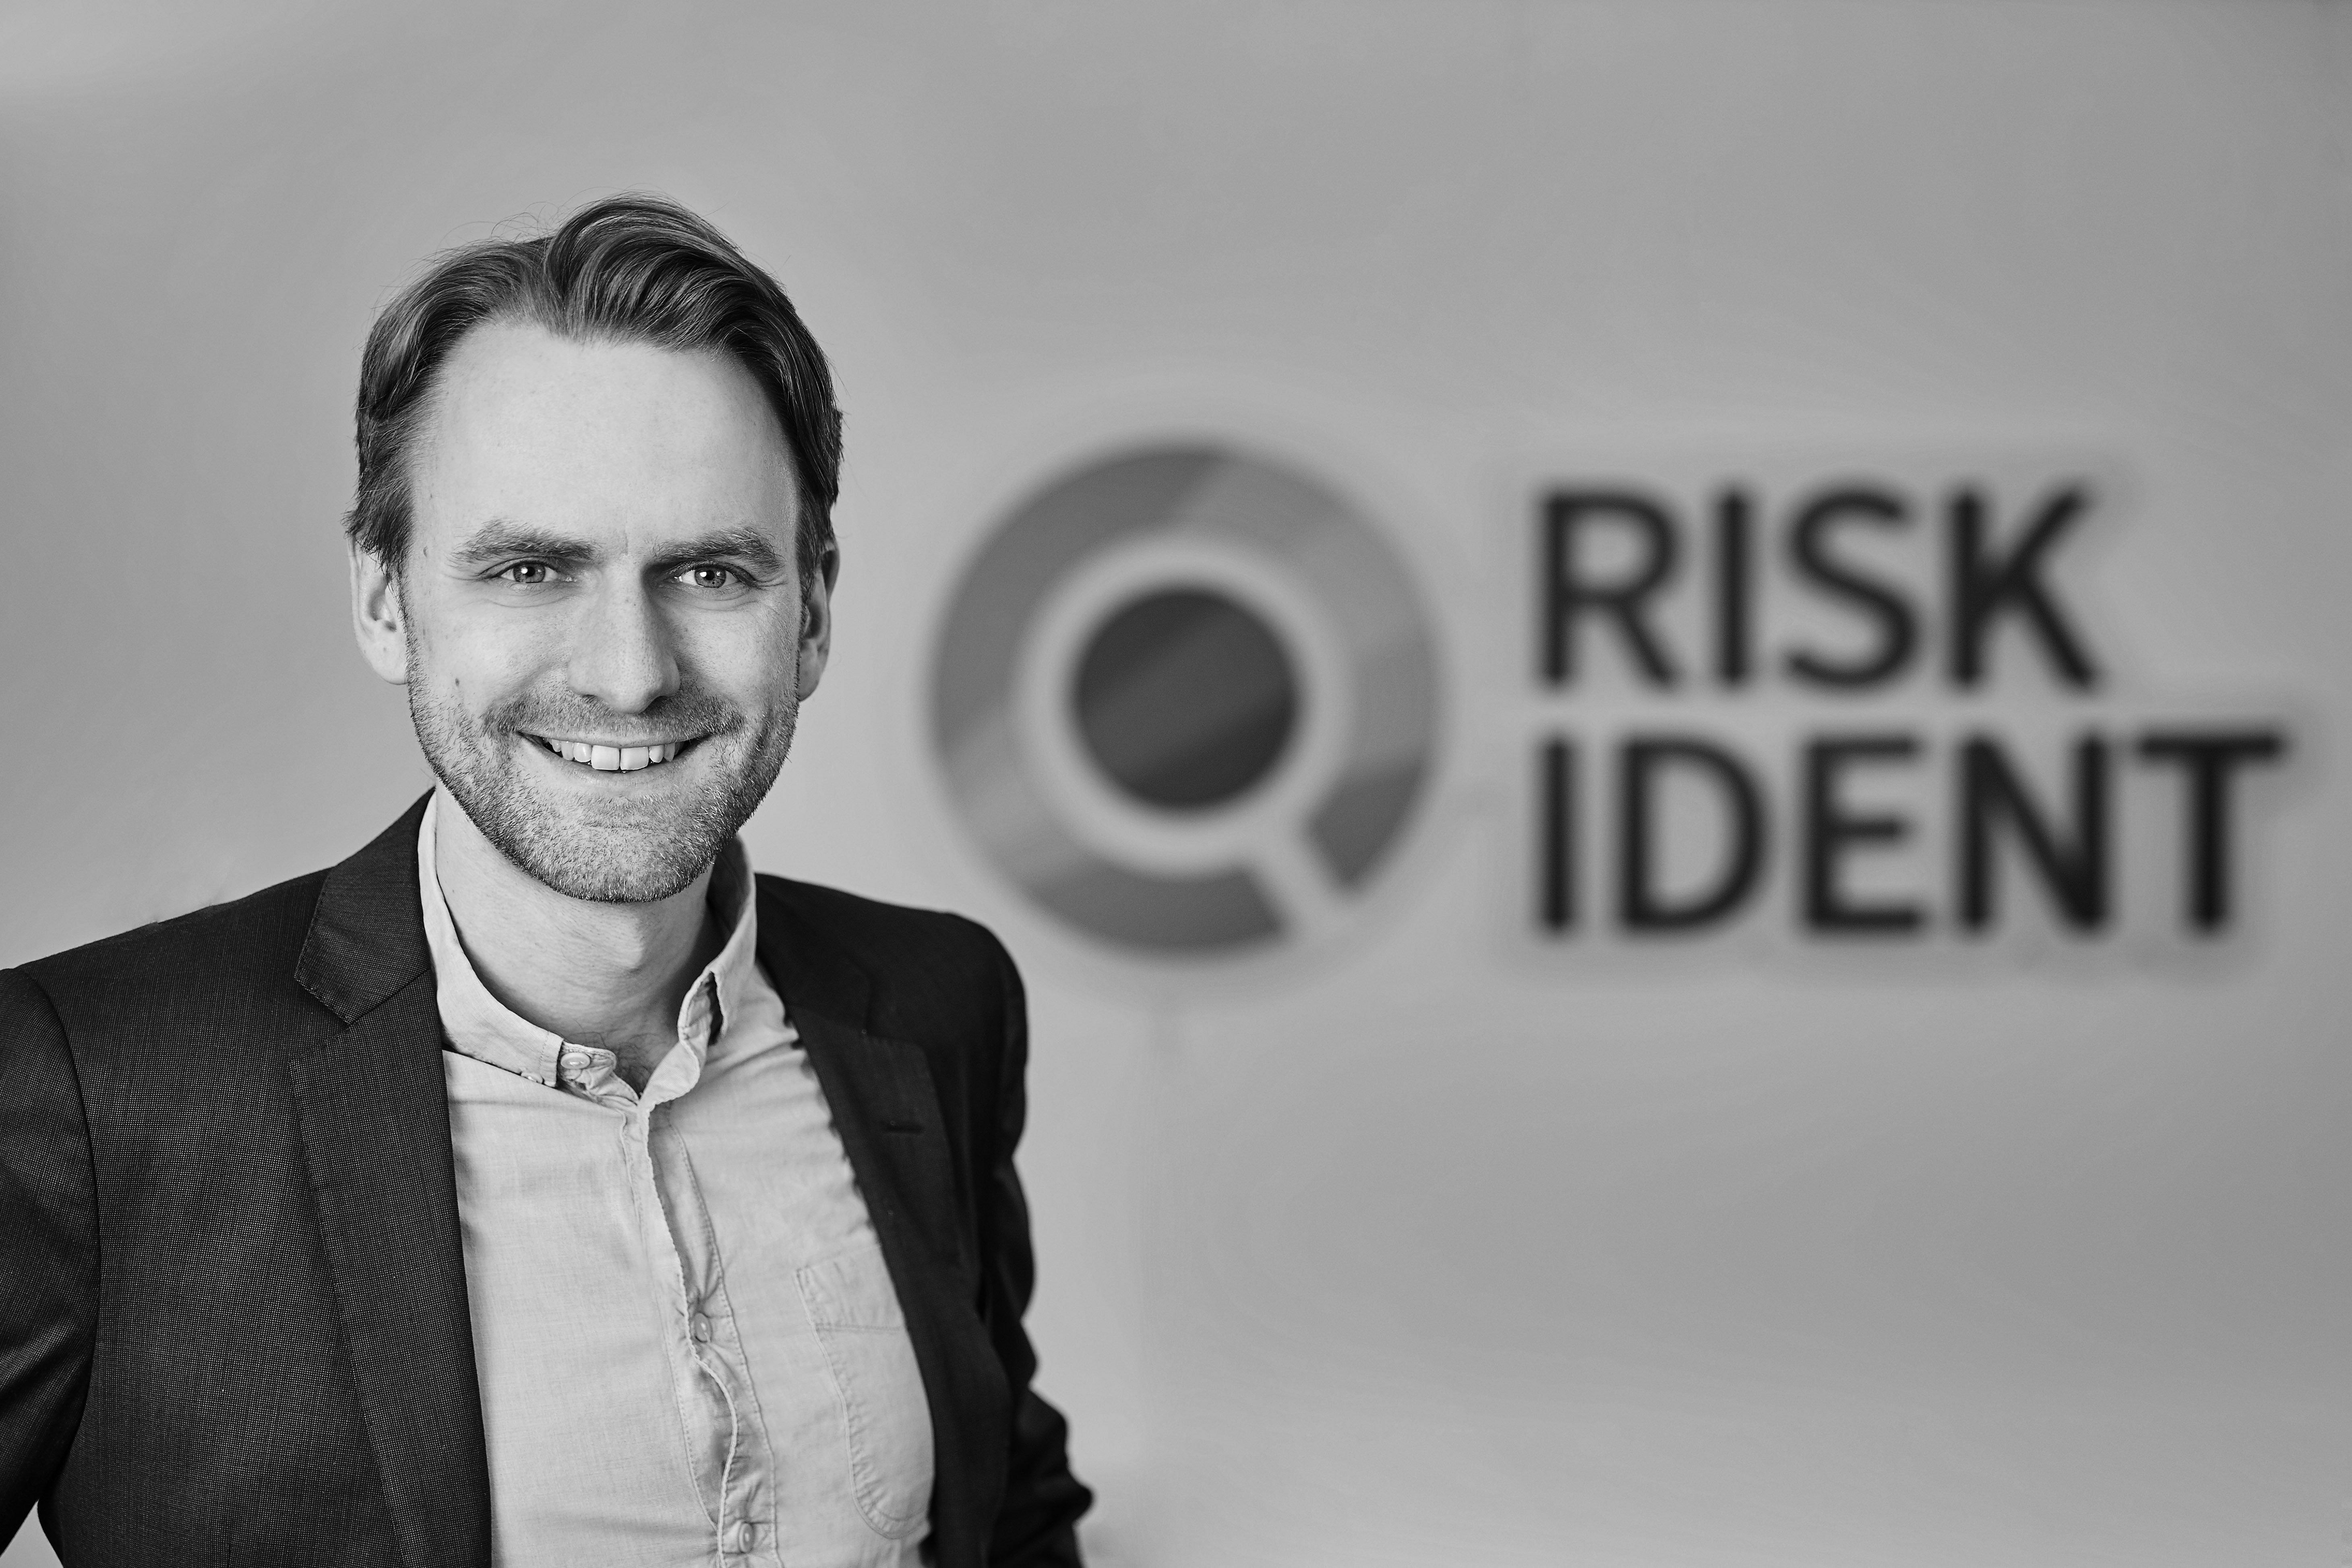 RiskIdent_Felix Eckhardt_sw